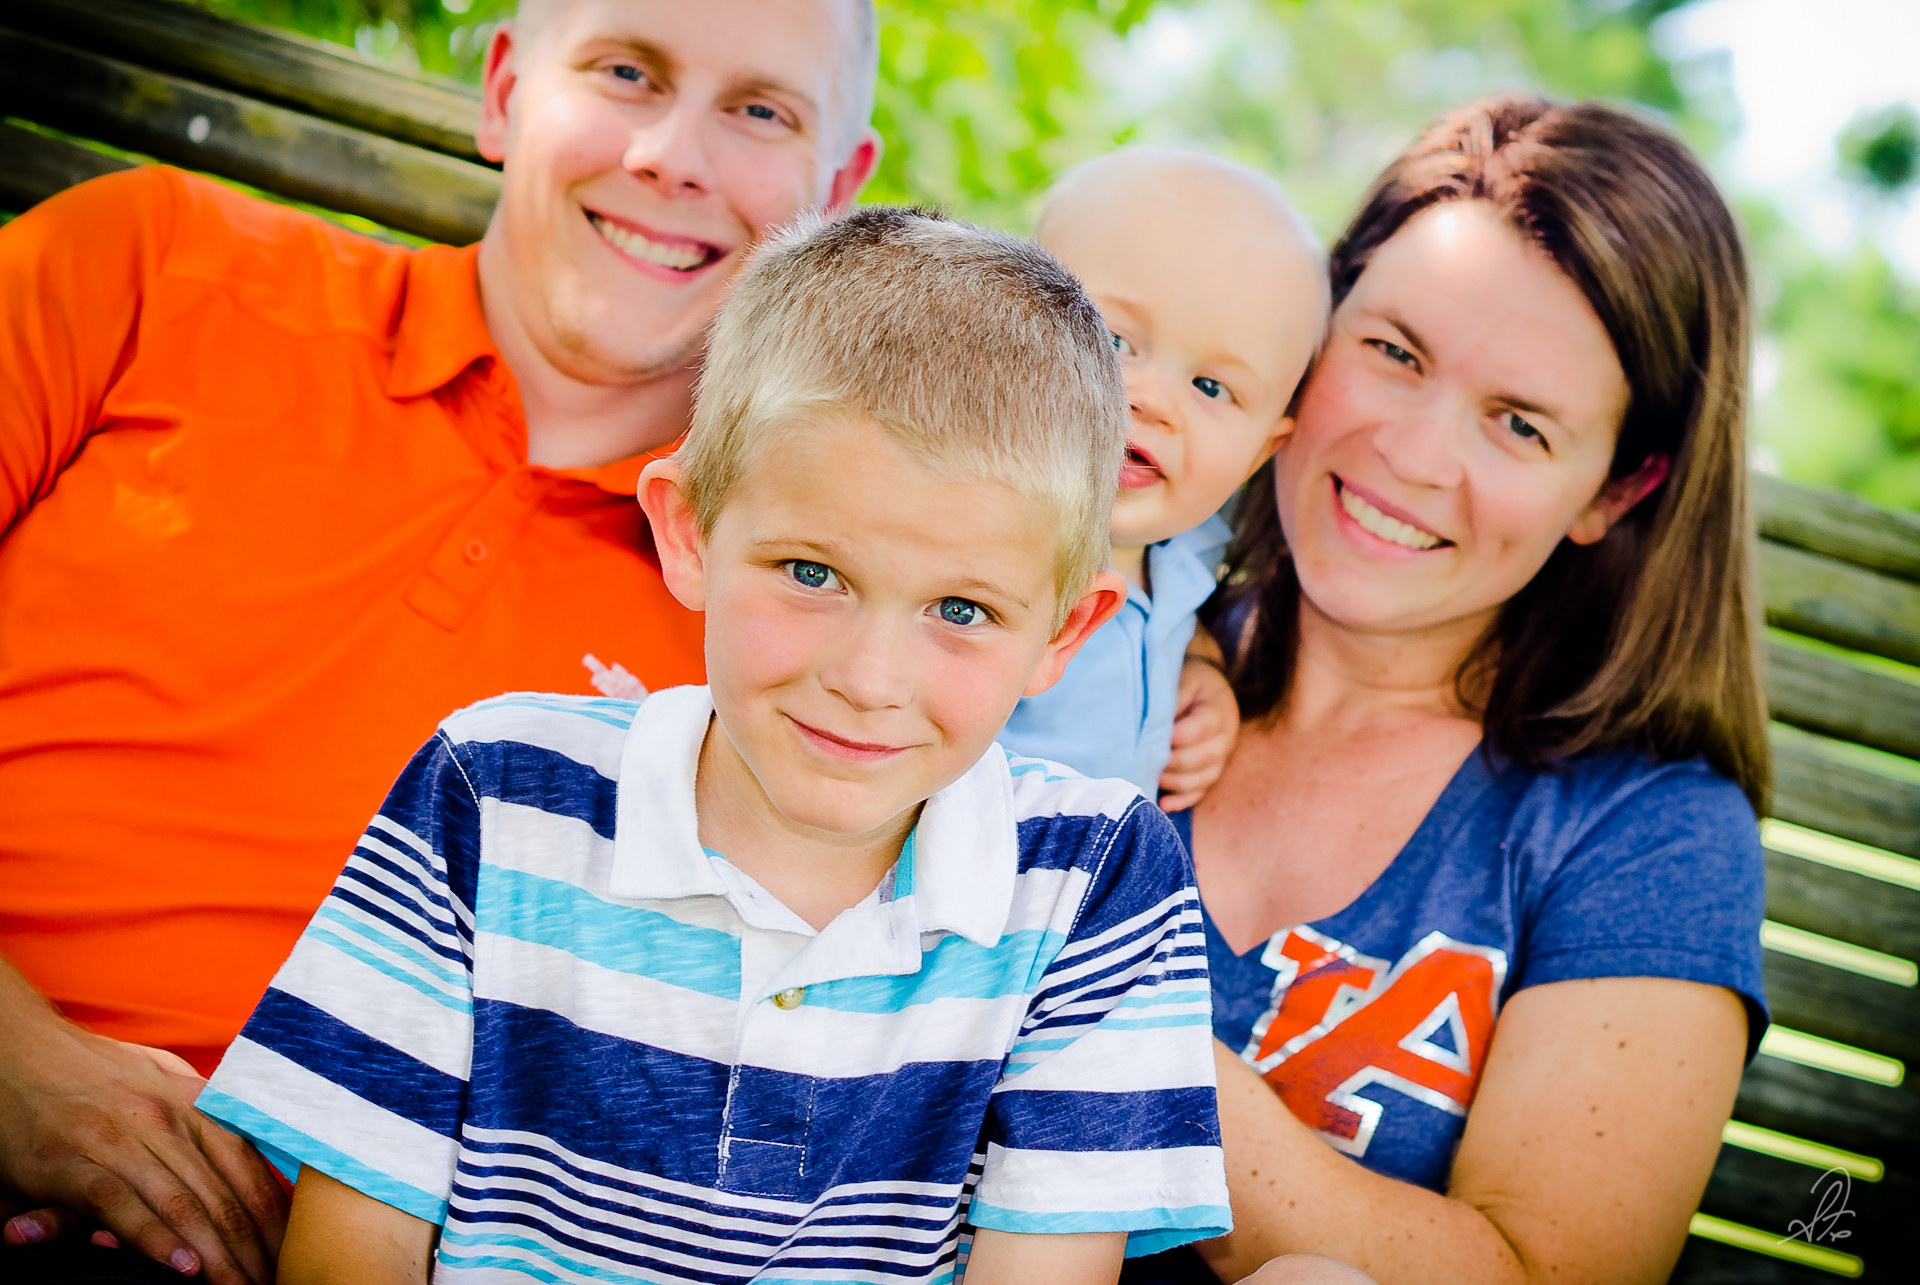 Fillmer Family on the Farm in Alabama